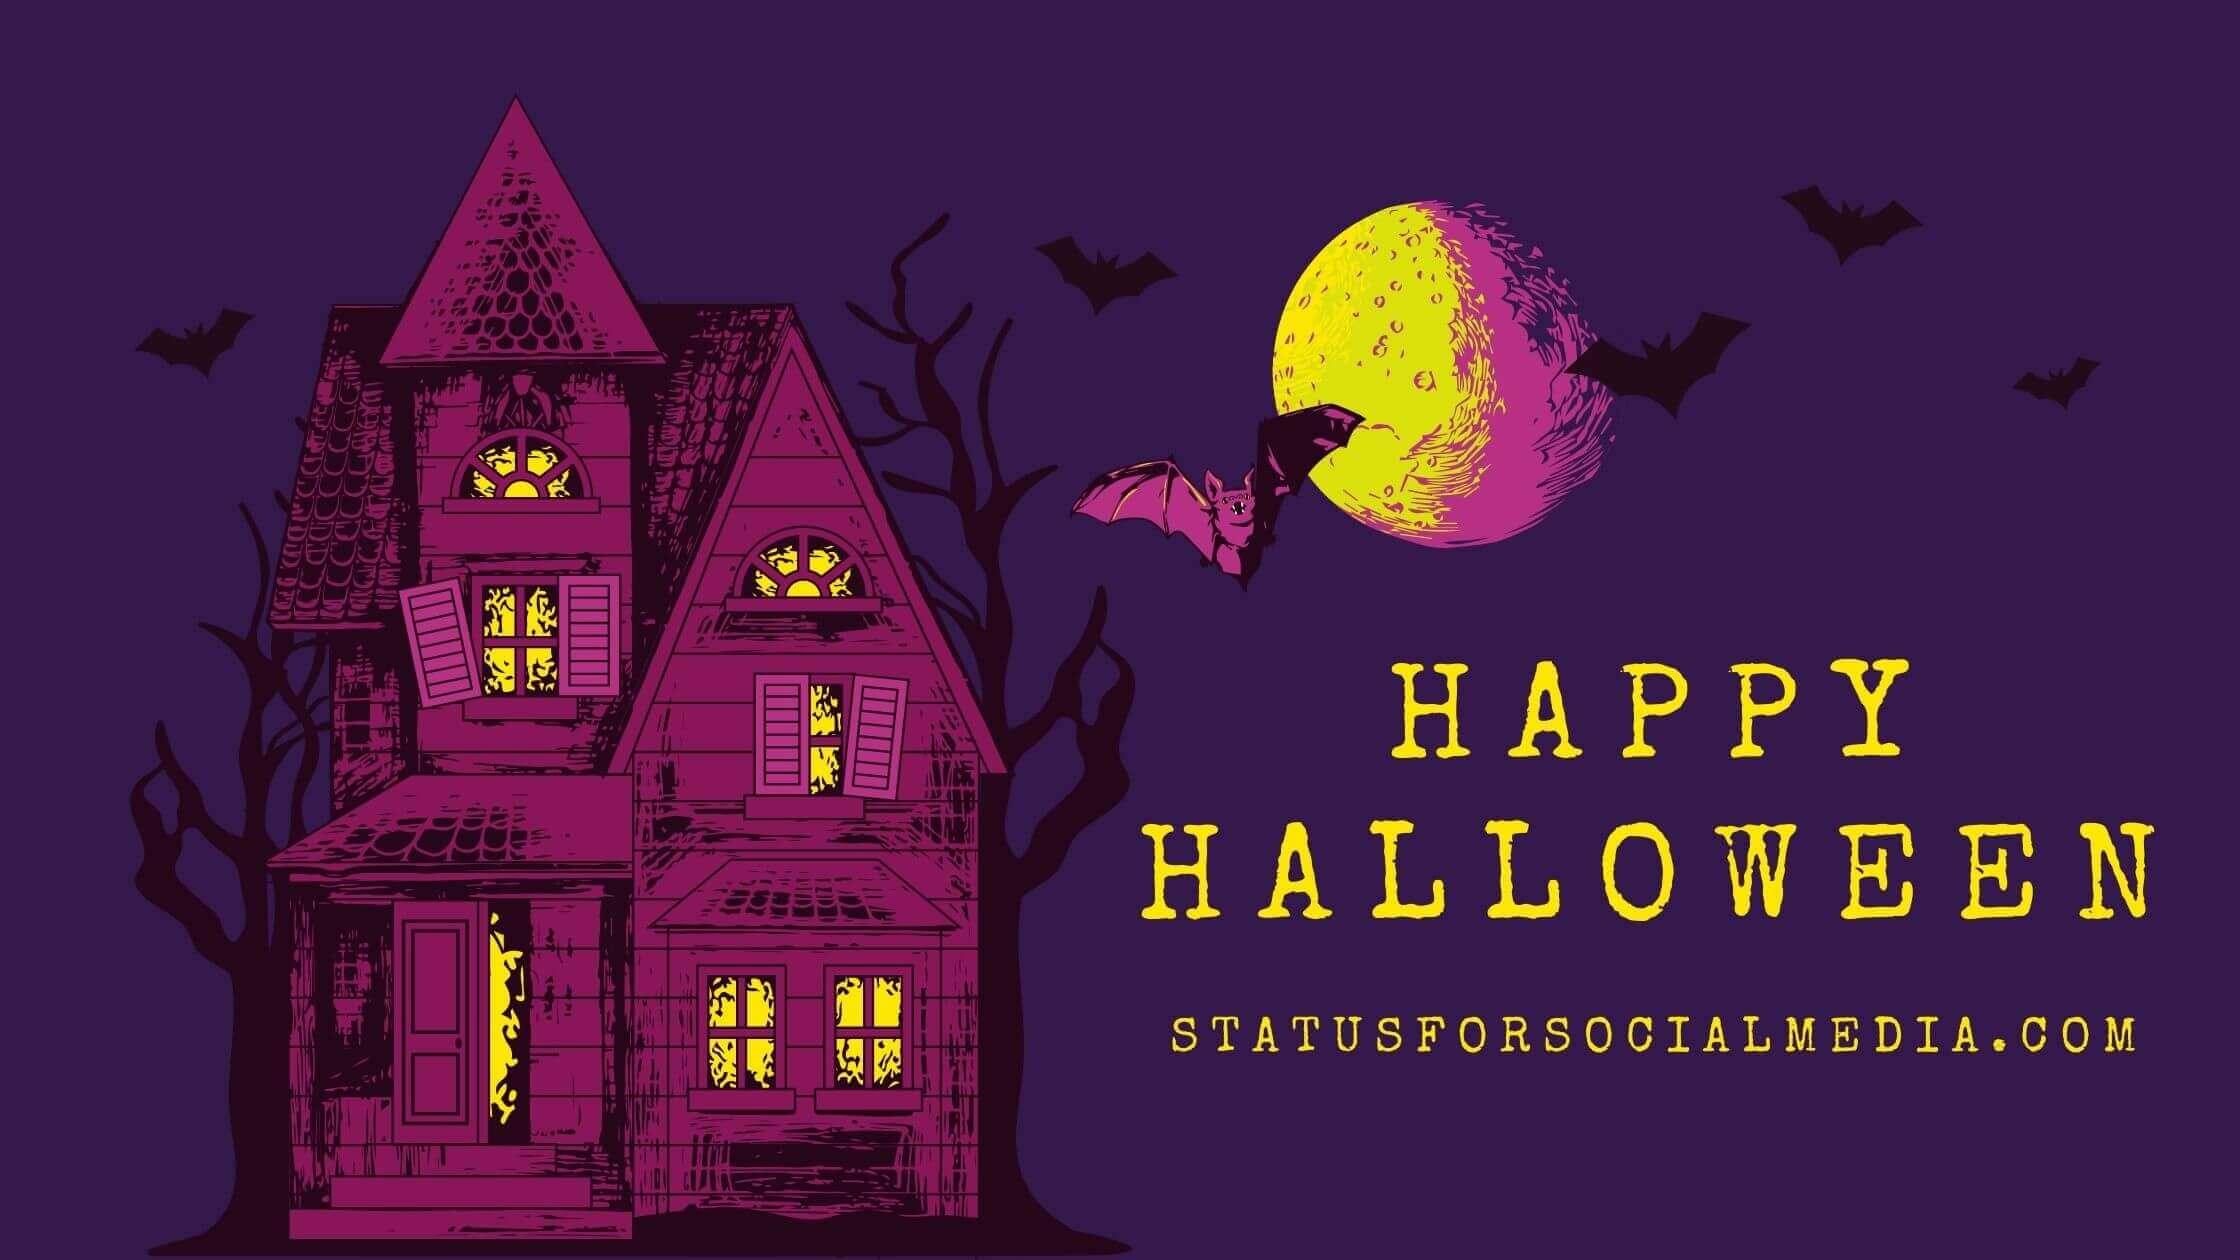 2020 Happy Halloween Wishes Greetings – Halloween Wishes